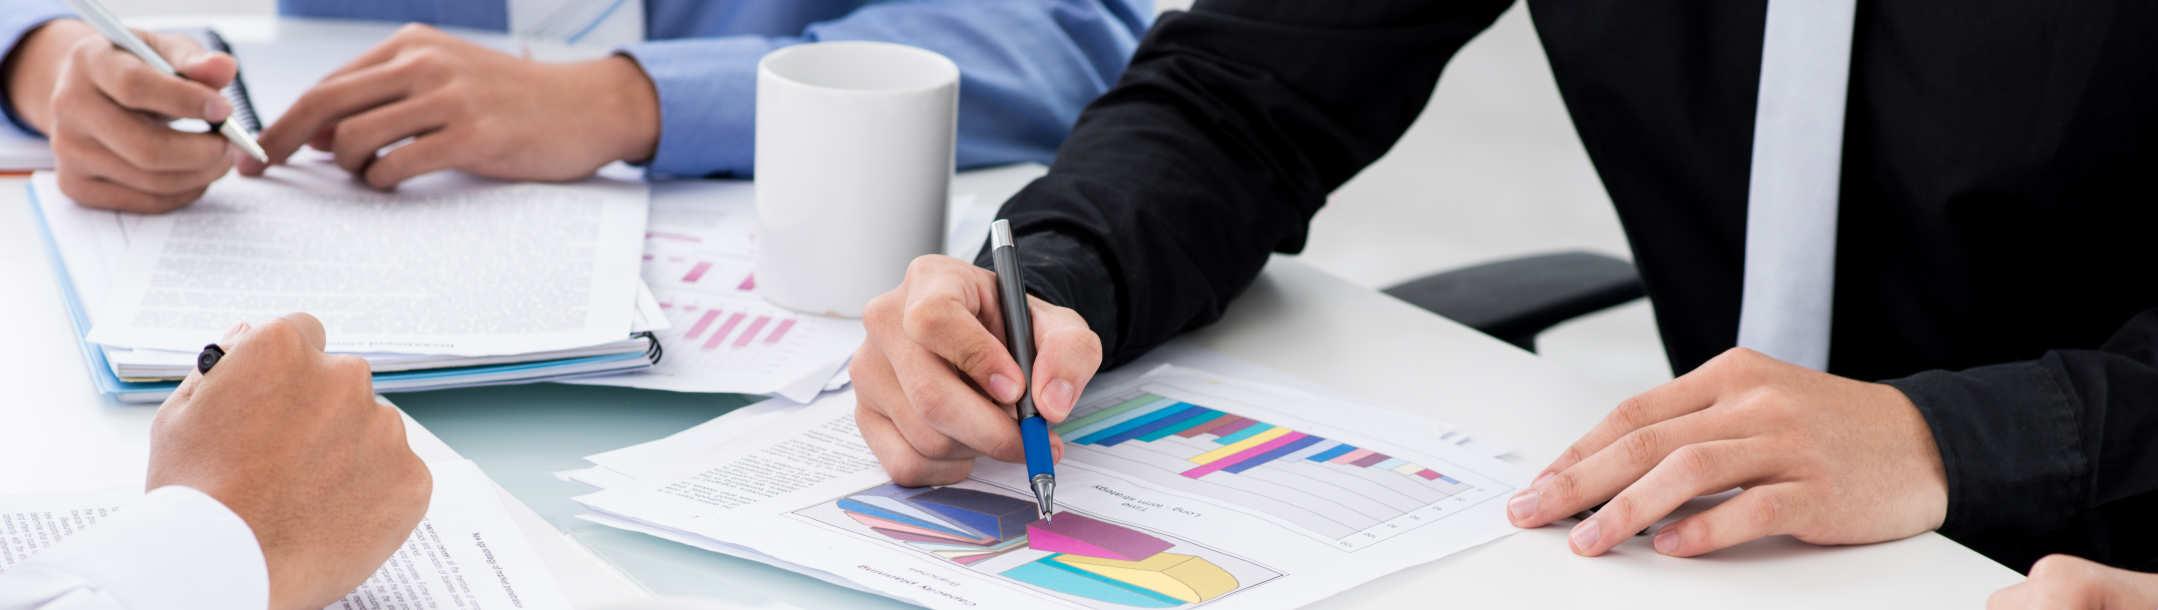 Short courses in health management. health management